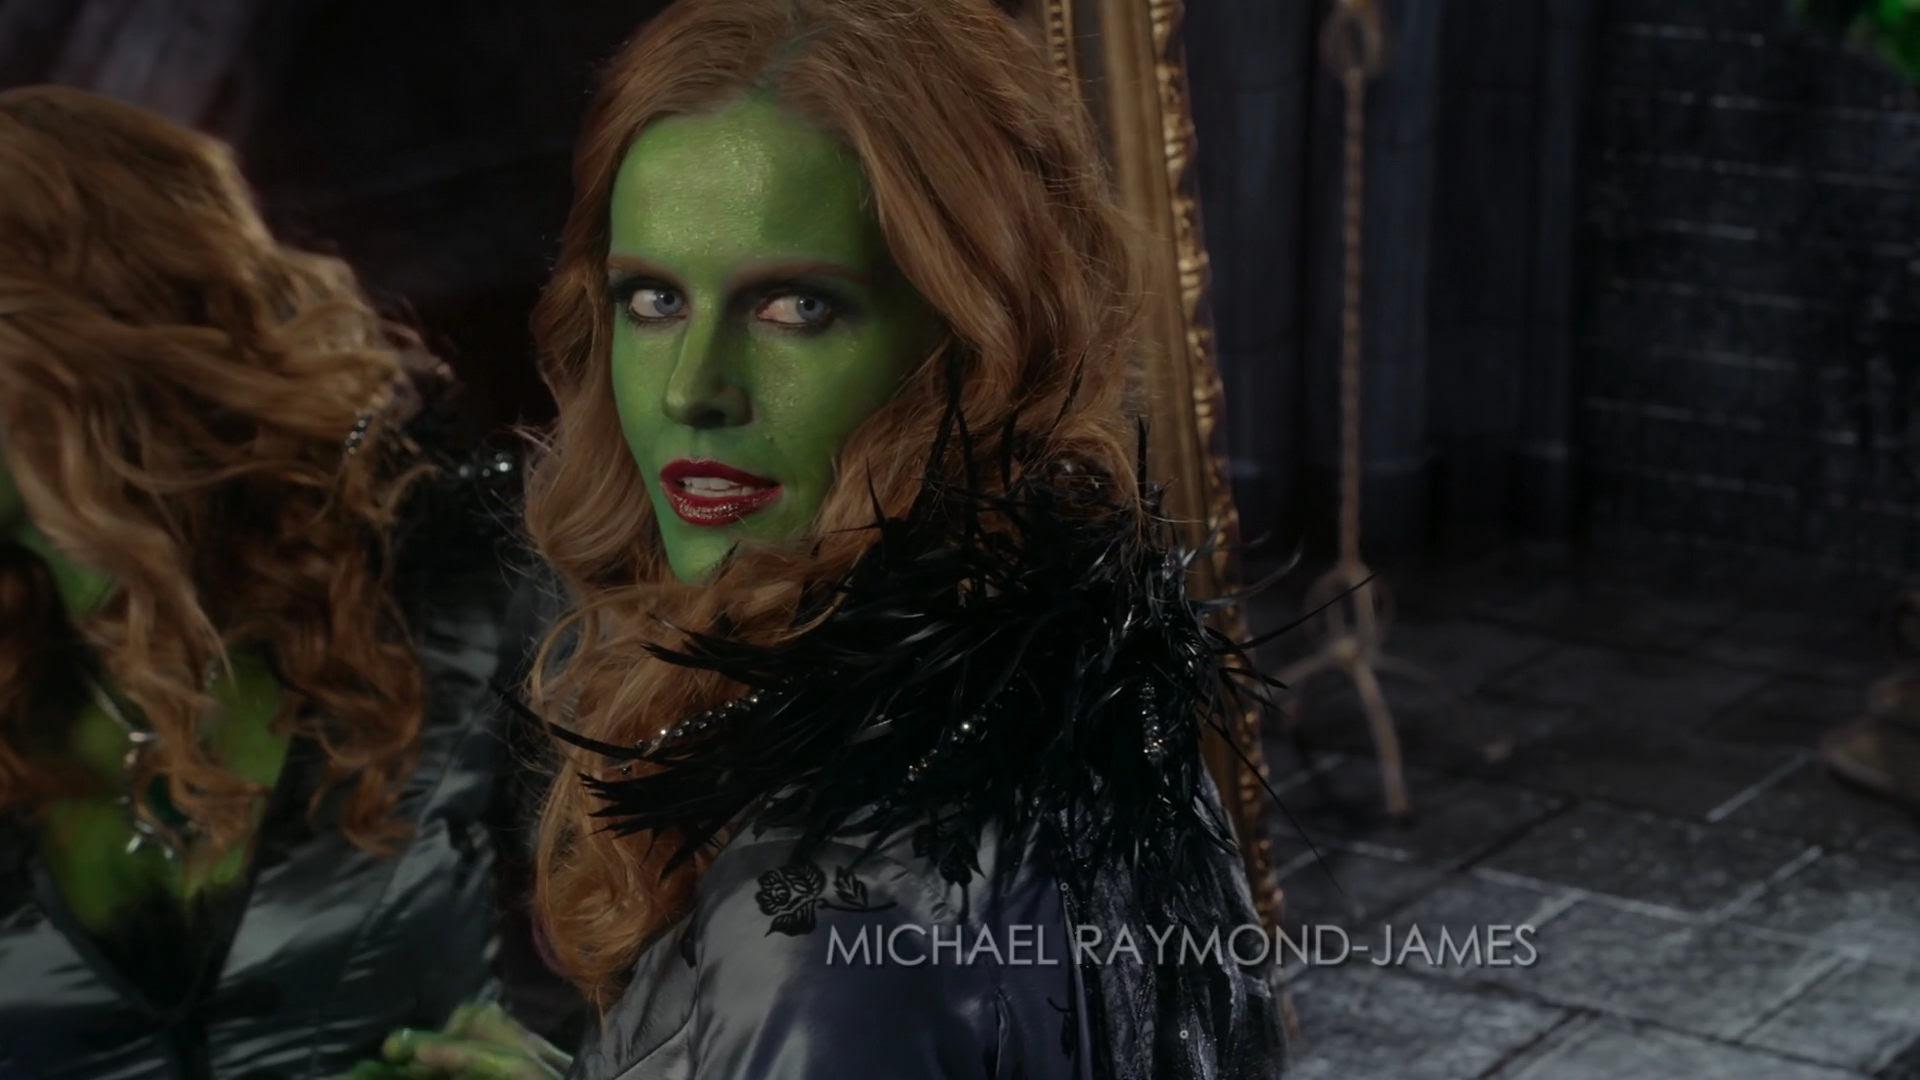 Zelena Wicked Witch Zelena The Wicked Witch Of The West Photo